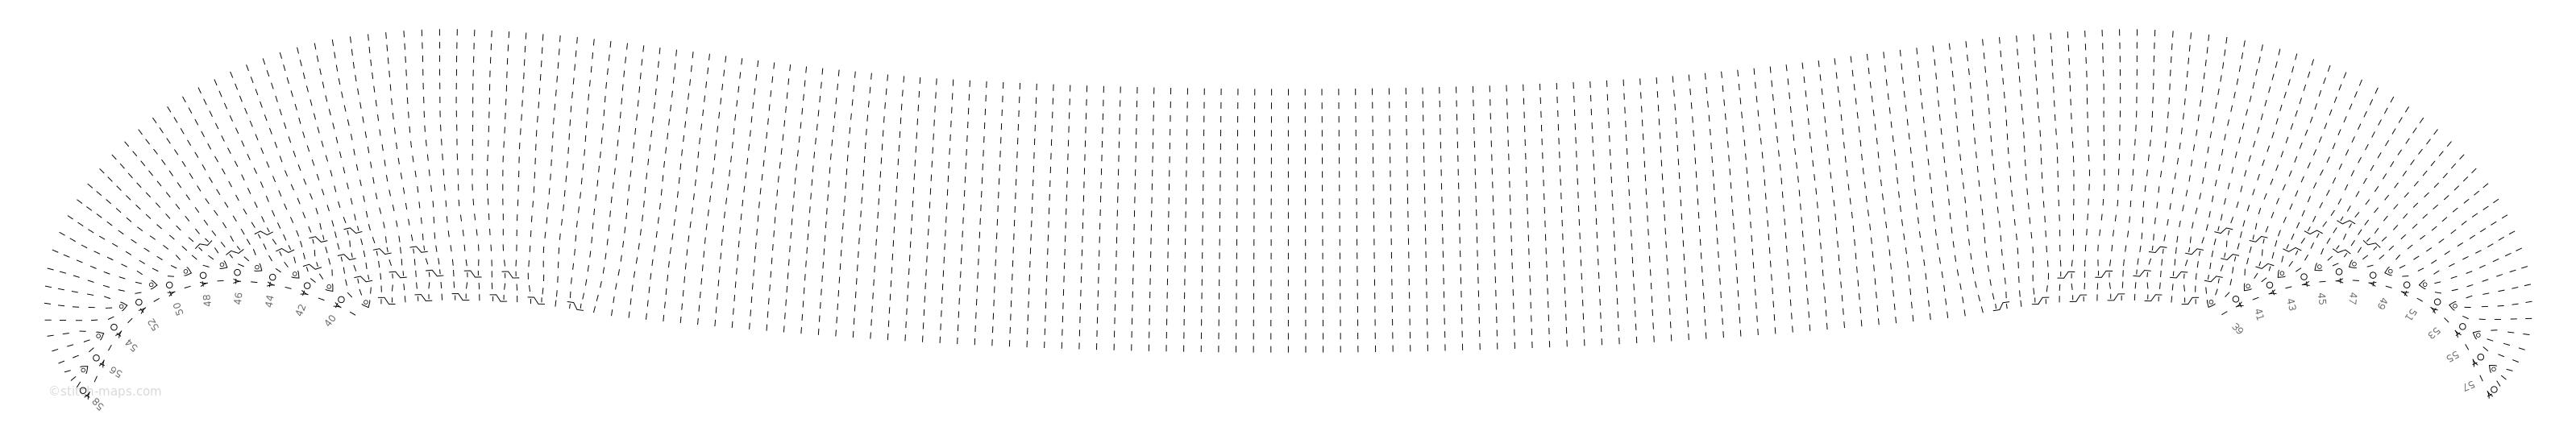 Crescent Shawl (body 2) chart